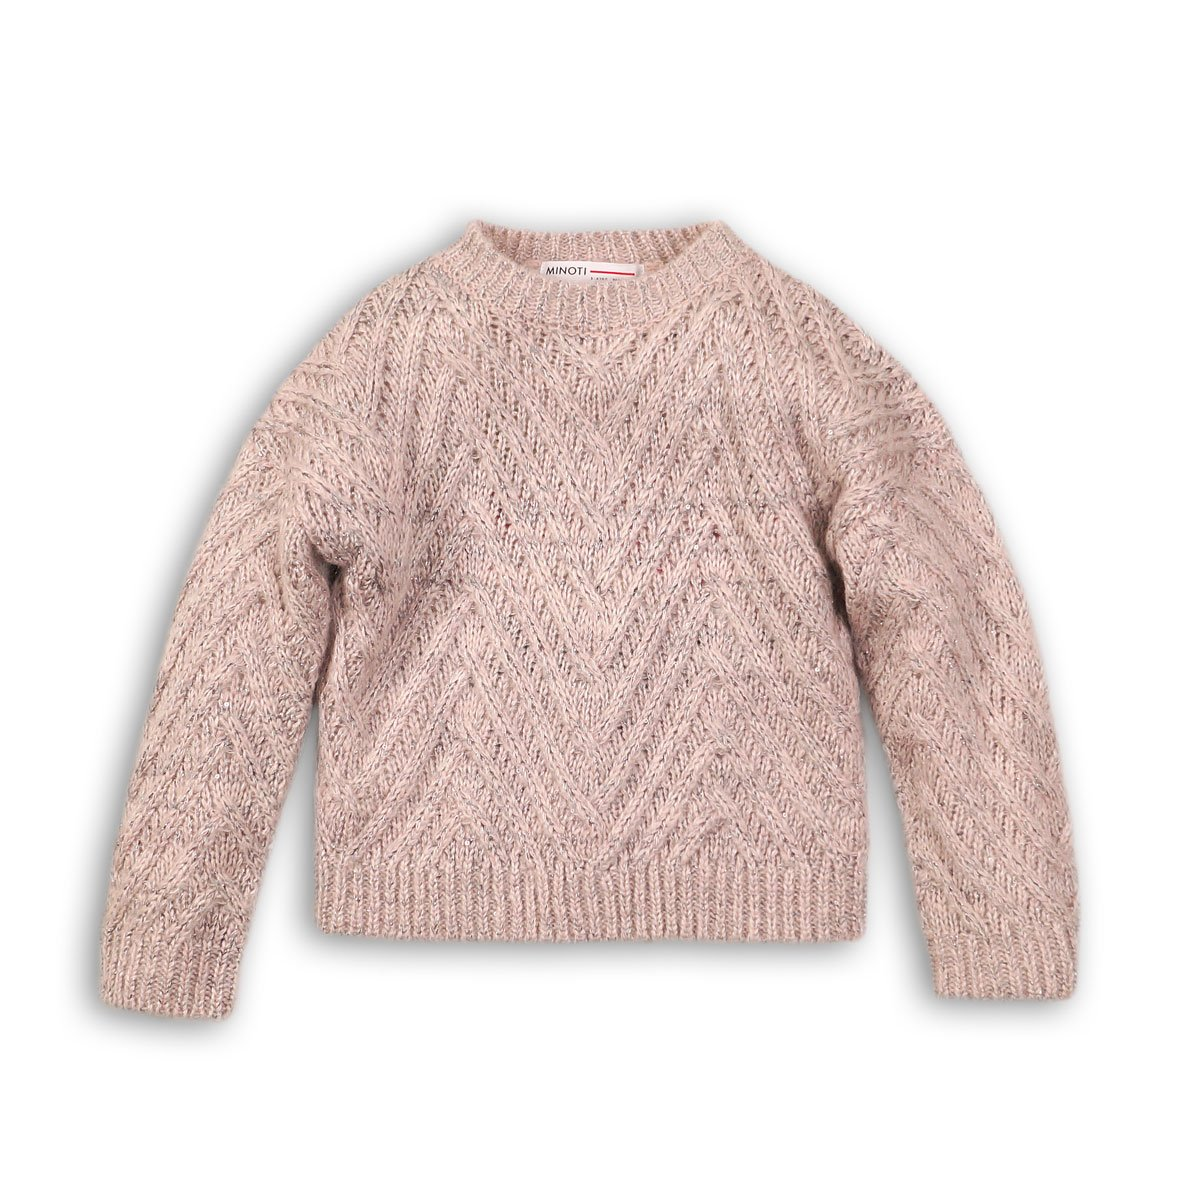 Pulover tricotat tesatura lurex si paiete Minoti